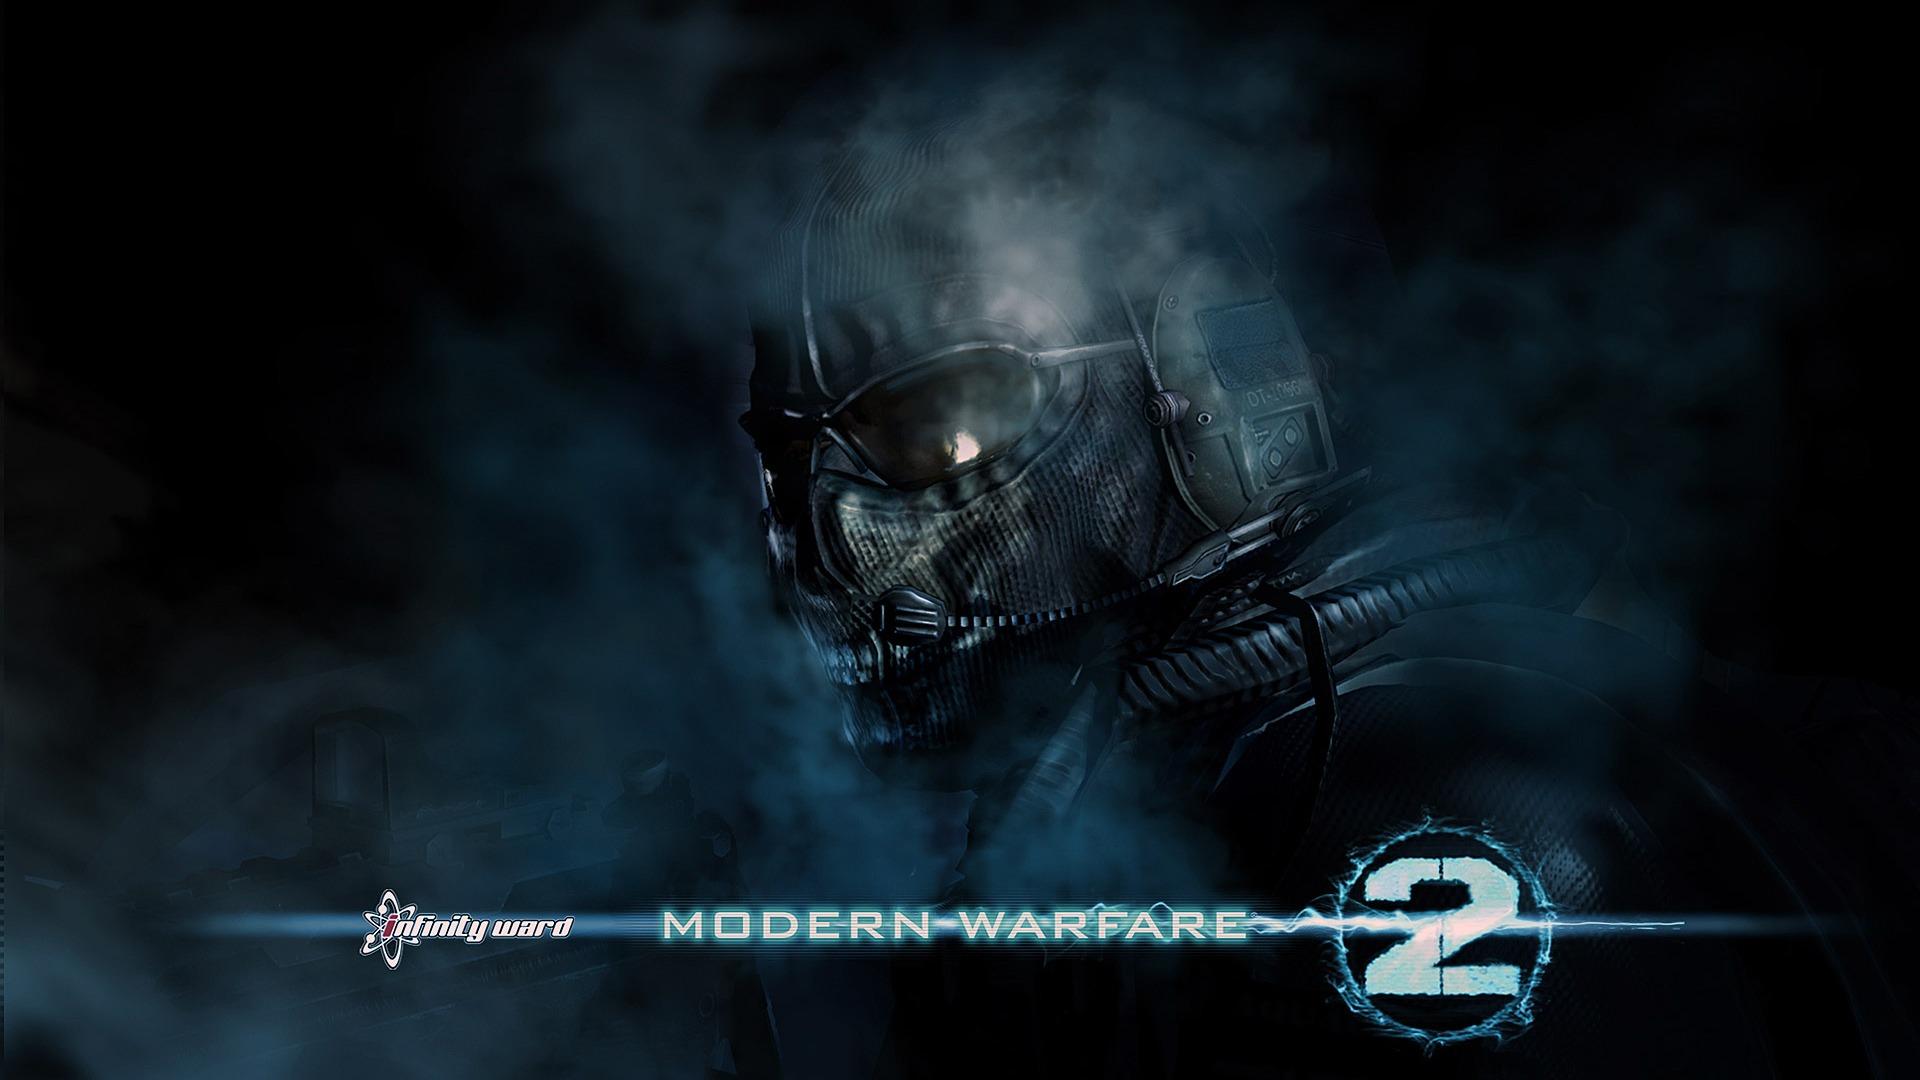 CoD Modern Warfare 2 Wallpaper 3D Characters 3D Wallpapers